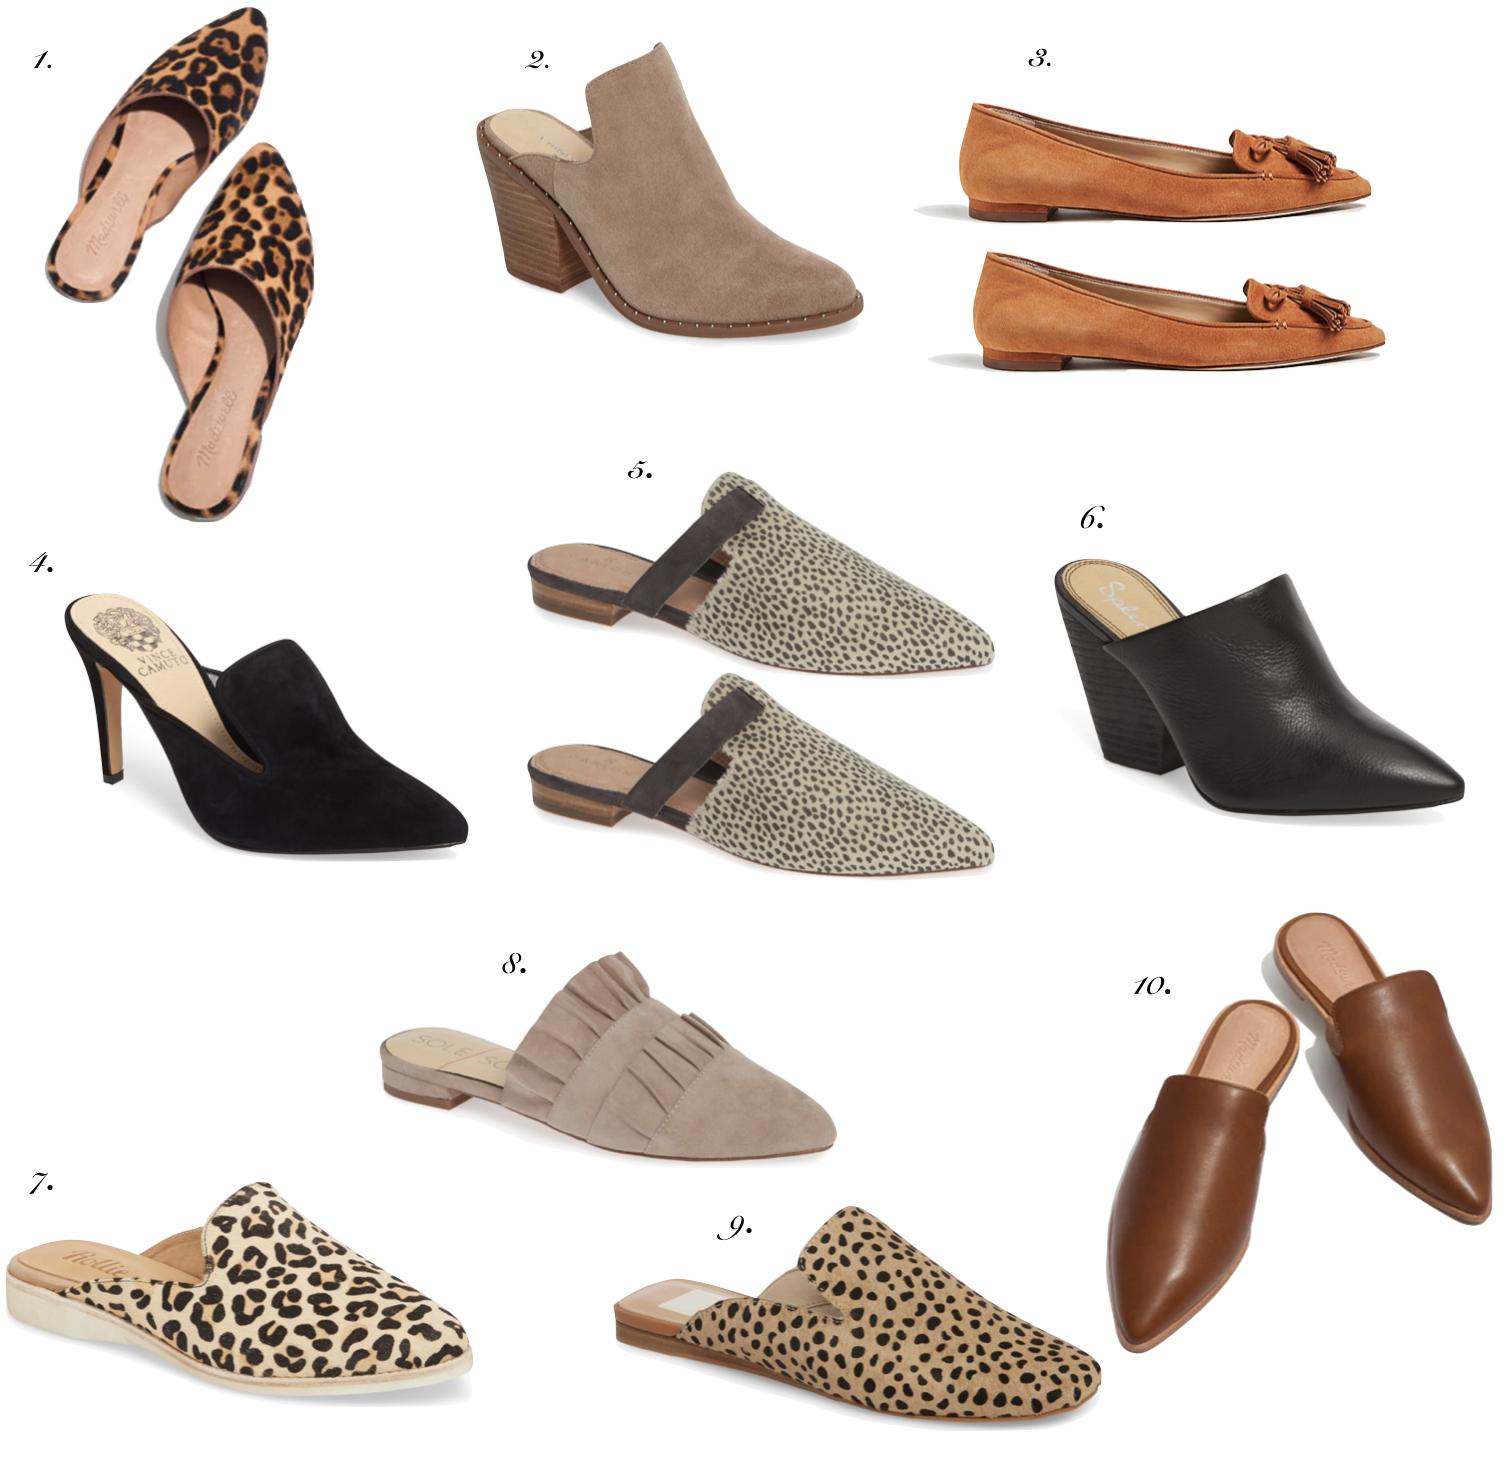 Fall shoe trend, Trending shoes, Fall shoes